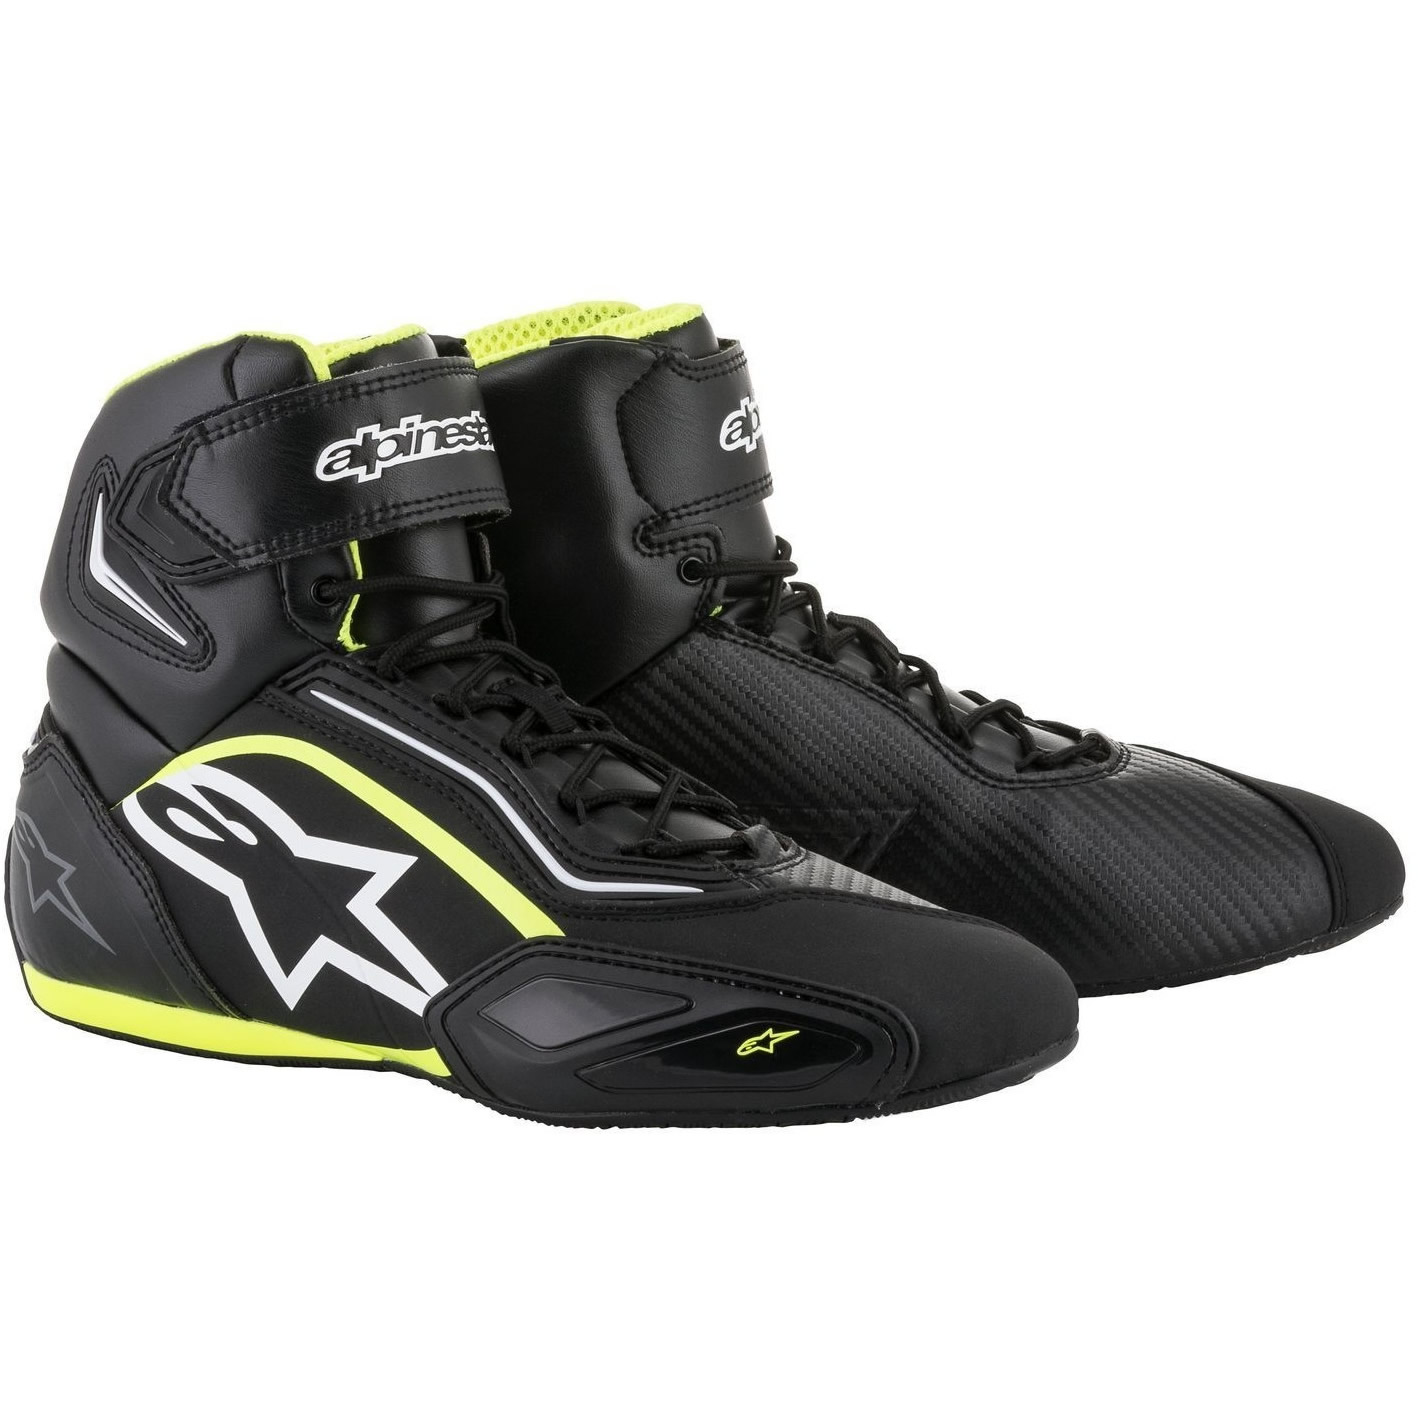 a870de732d3dc1 Sentinel Alpinestars Stella Faster 2 Ladies Motorcycle Boots 42 Black  Yellow (UK 8)